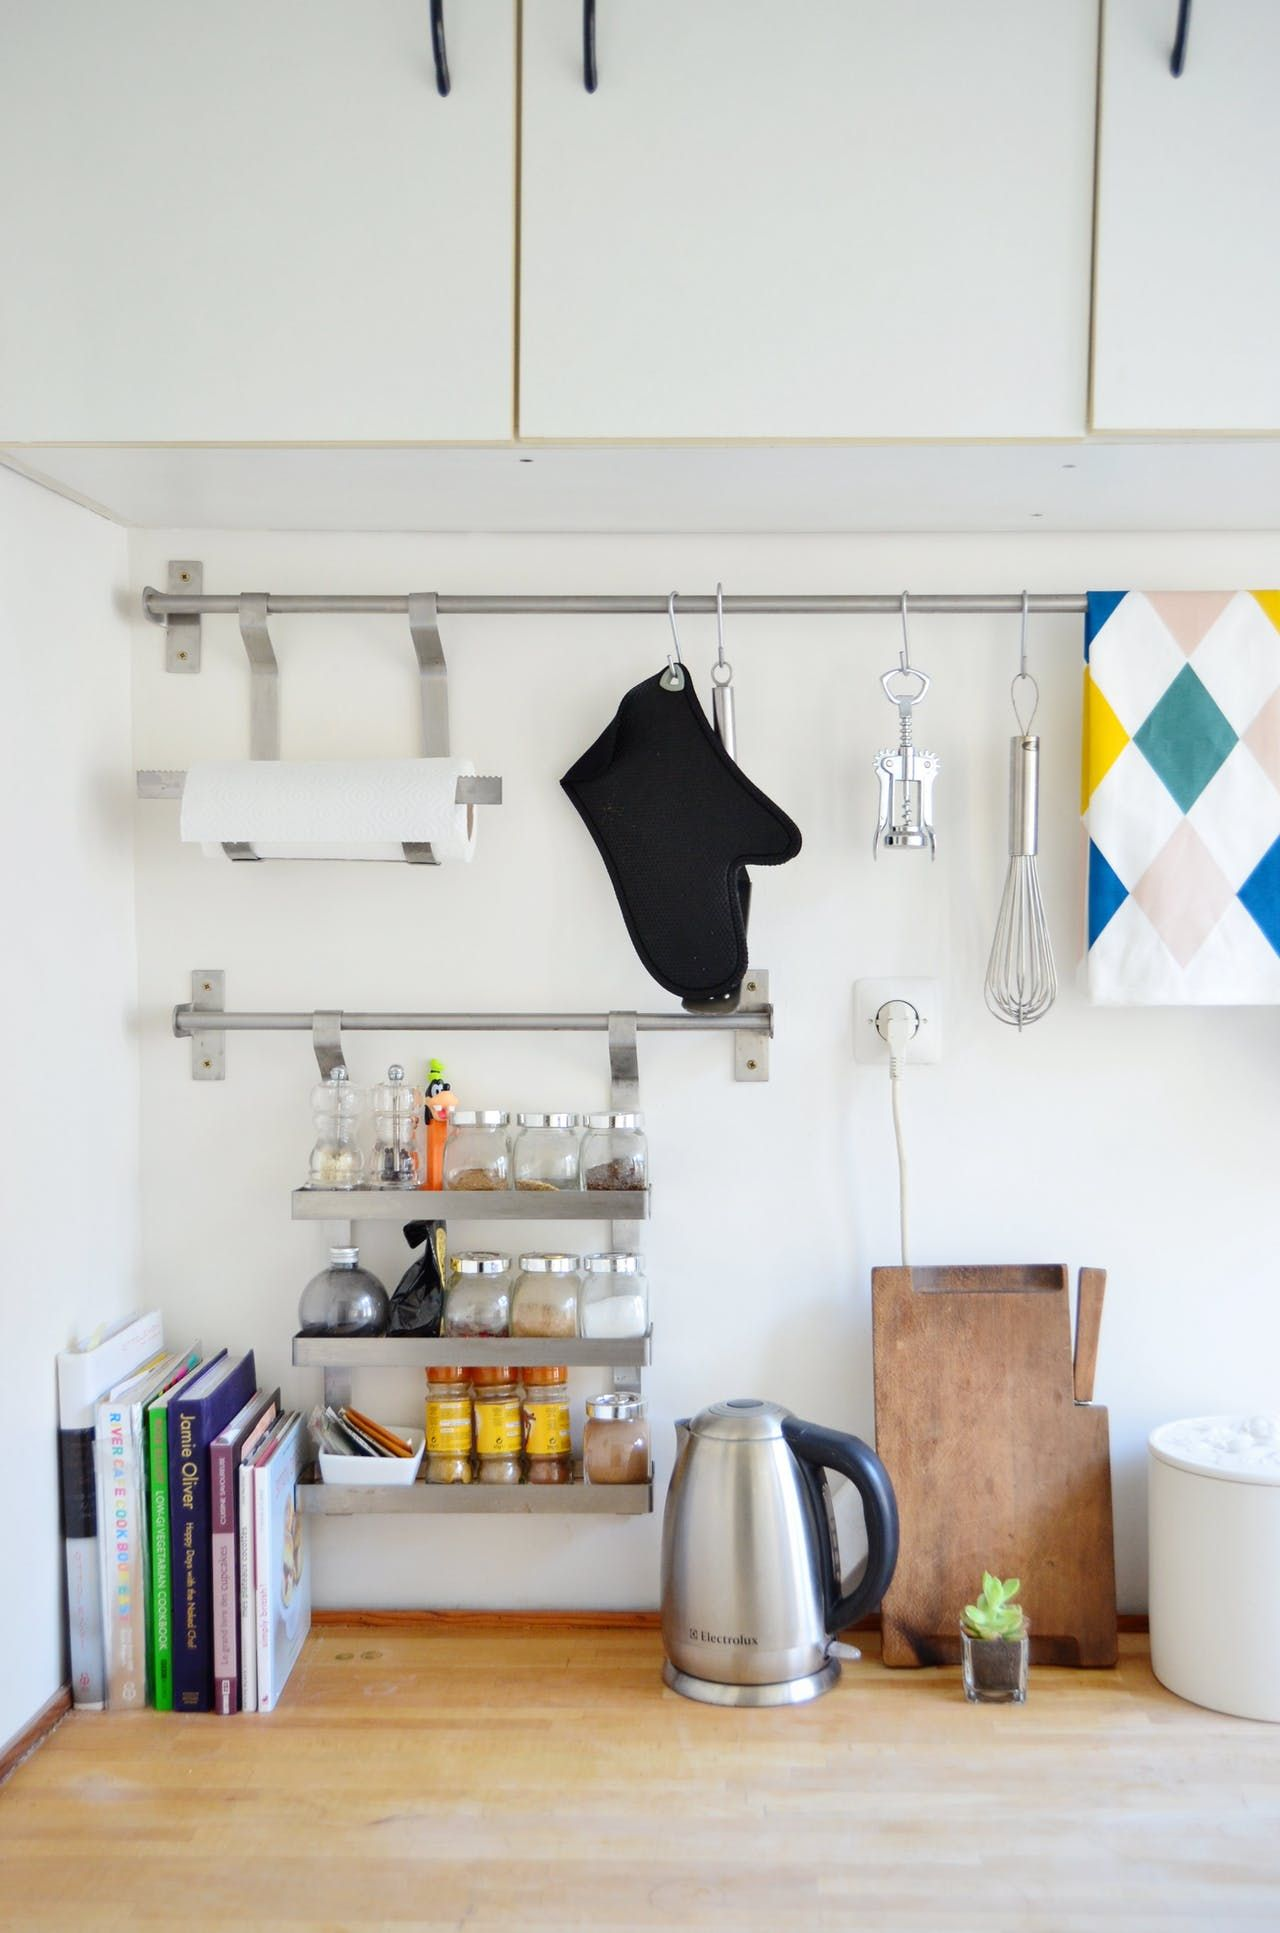 Kim S Sunny Small Space In Paris Petit Stockage De Cuisine